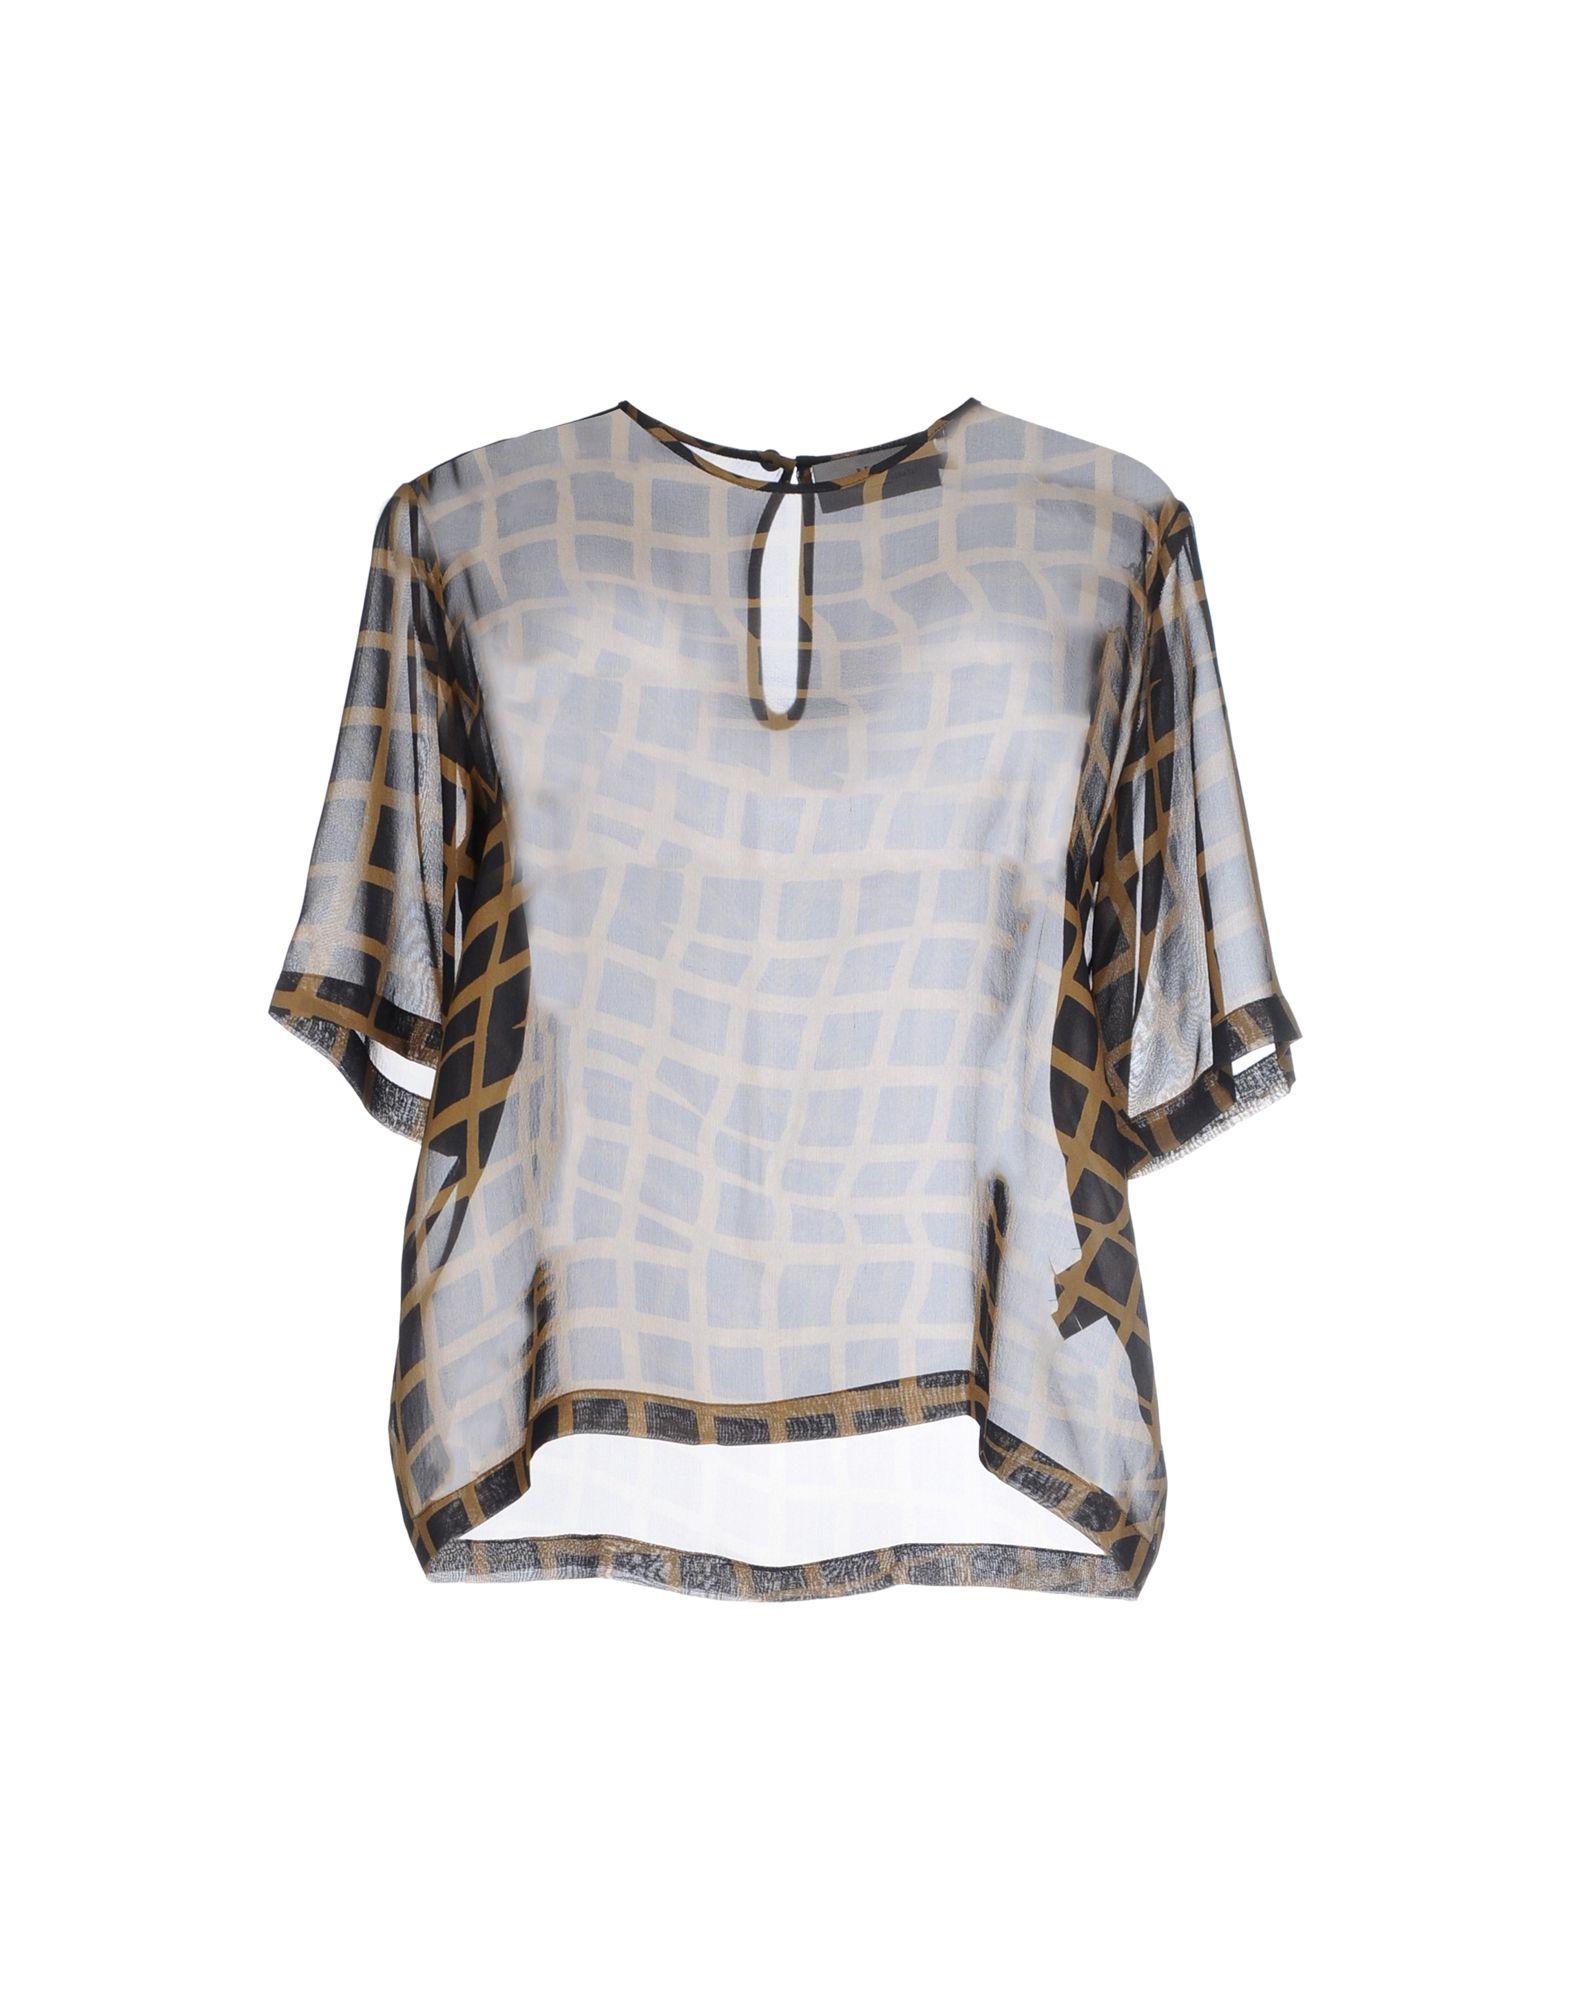 PREEN by THORNTON BREGAZZI Damen Bluse Farbe Schwarz Größe 3